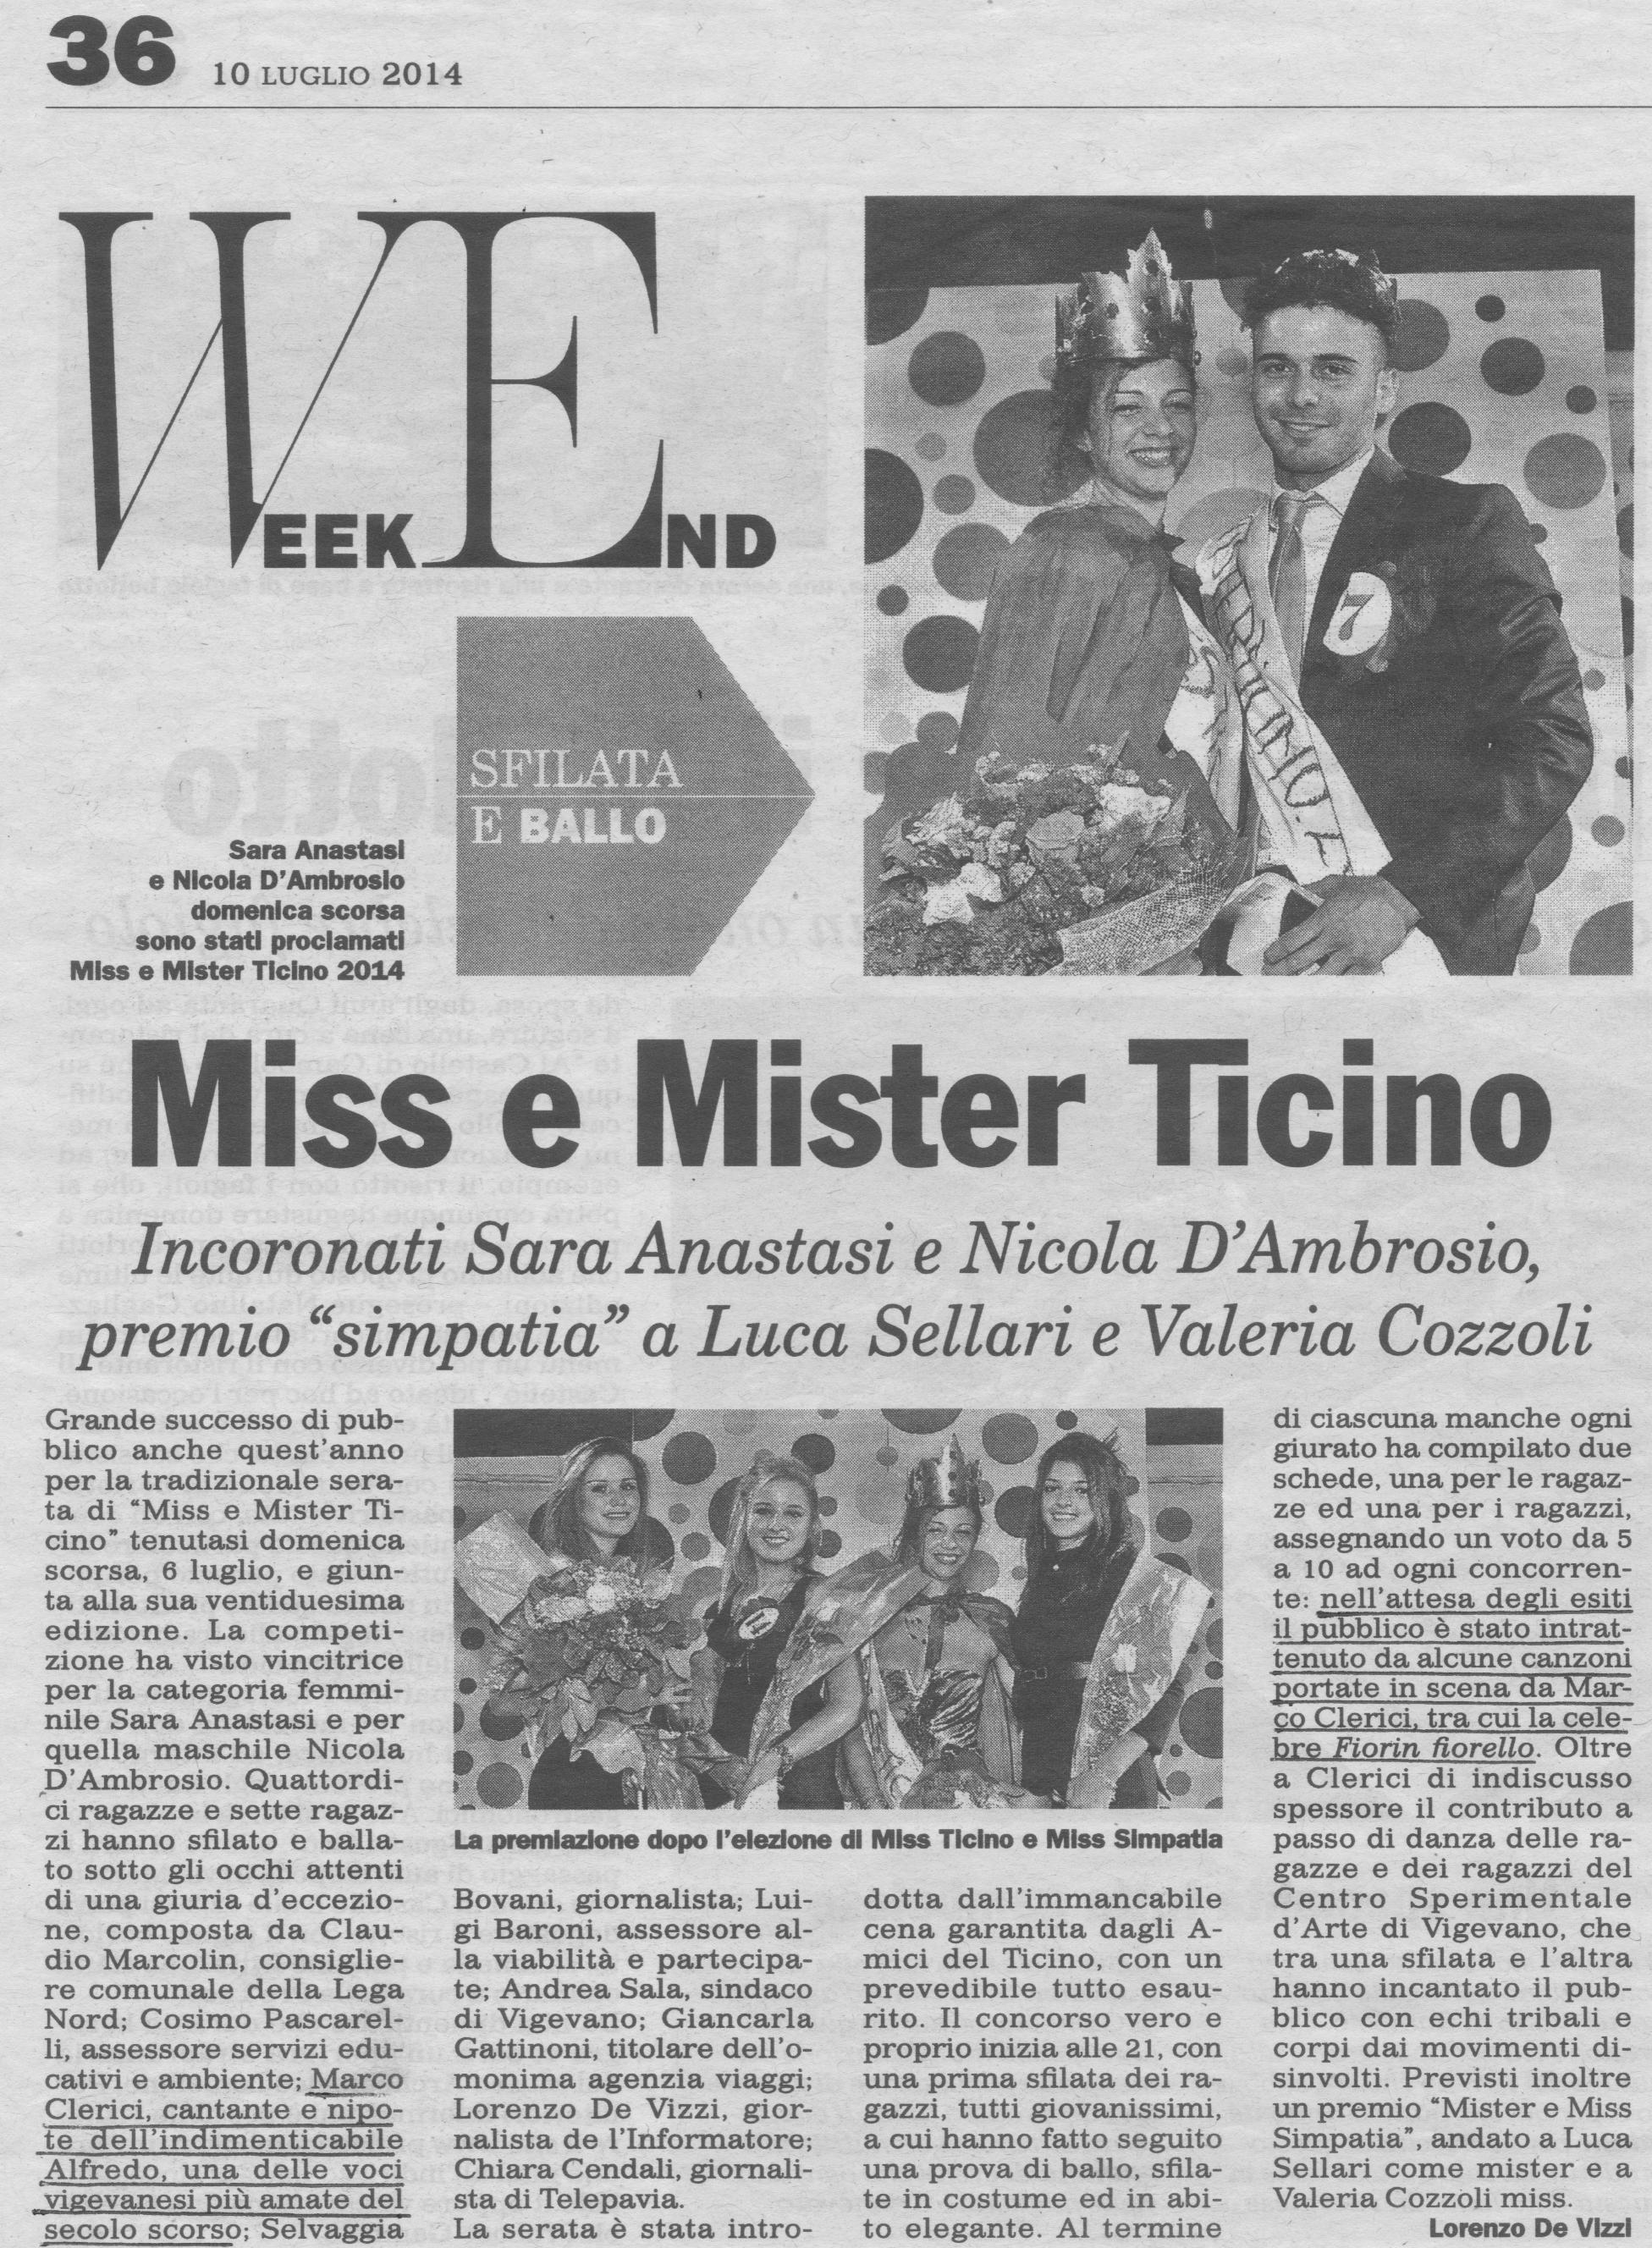 Marco Clerici in giuria per Miss e Mr Ticino 2014